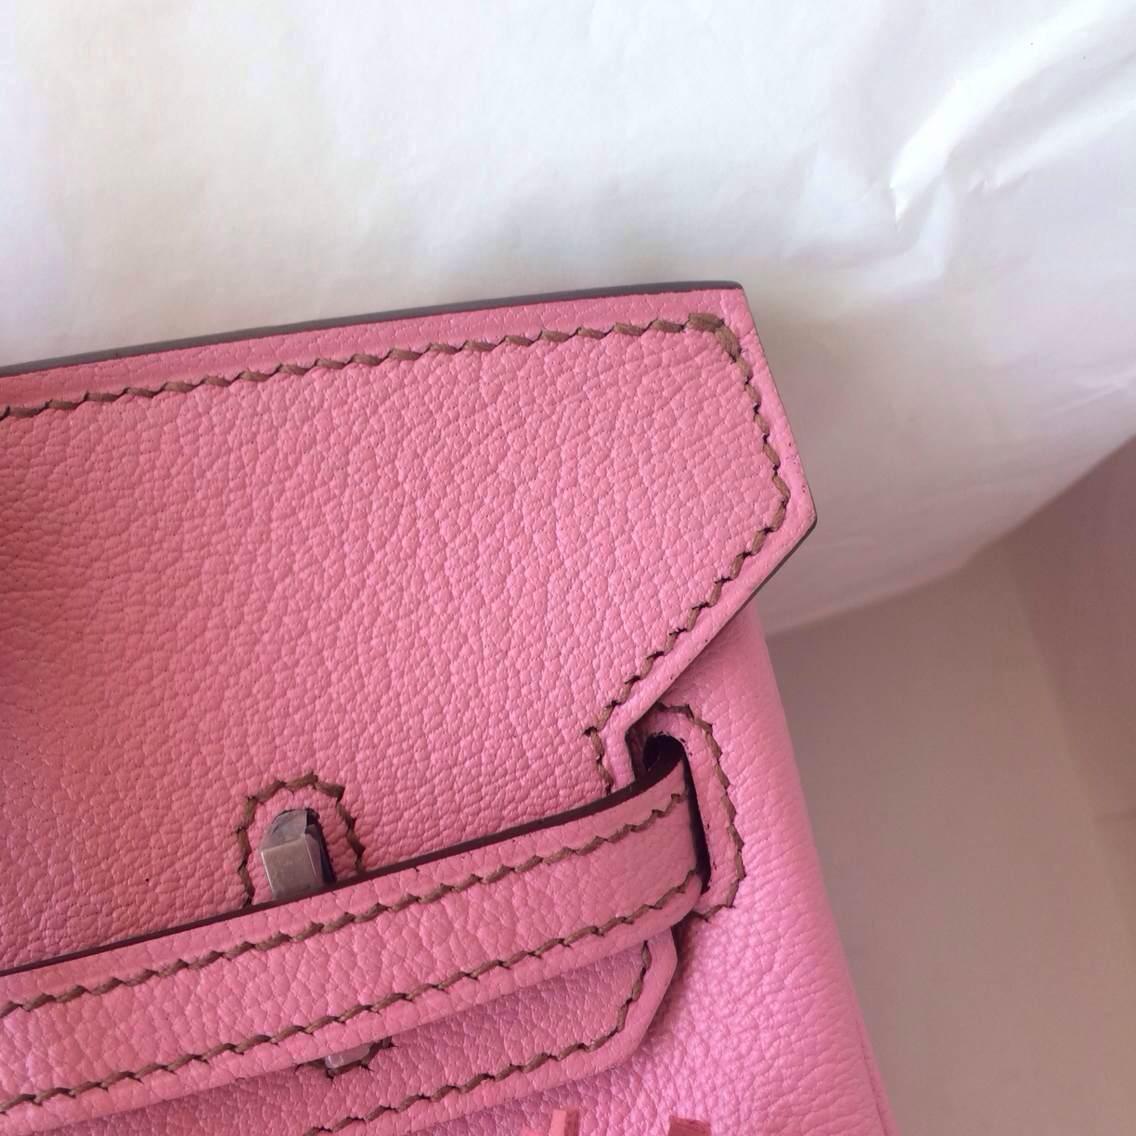 Hand Stitching Hermes Birkin Bag 25cm 5P Pink France Chevre leather